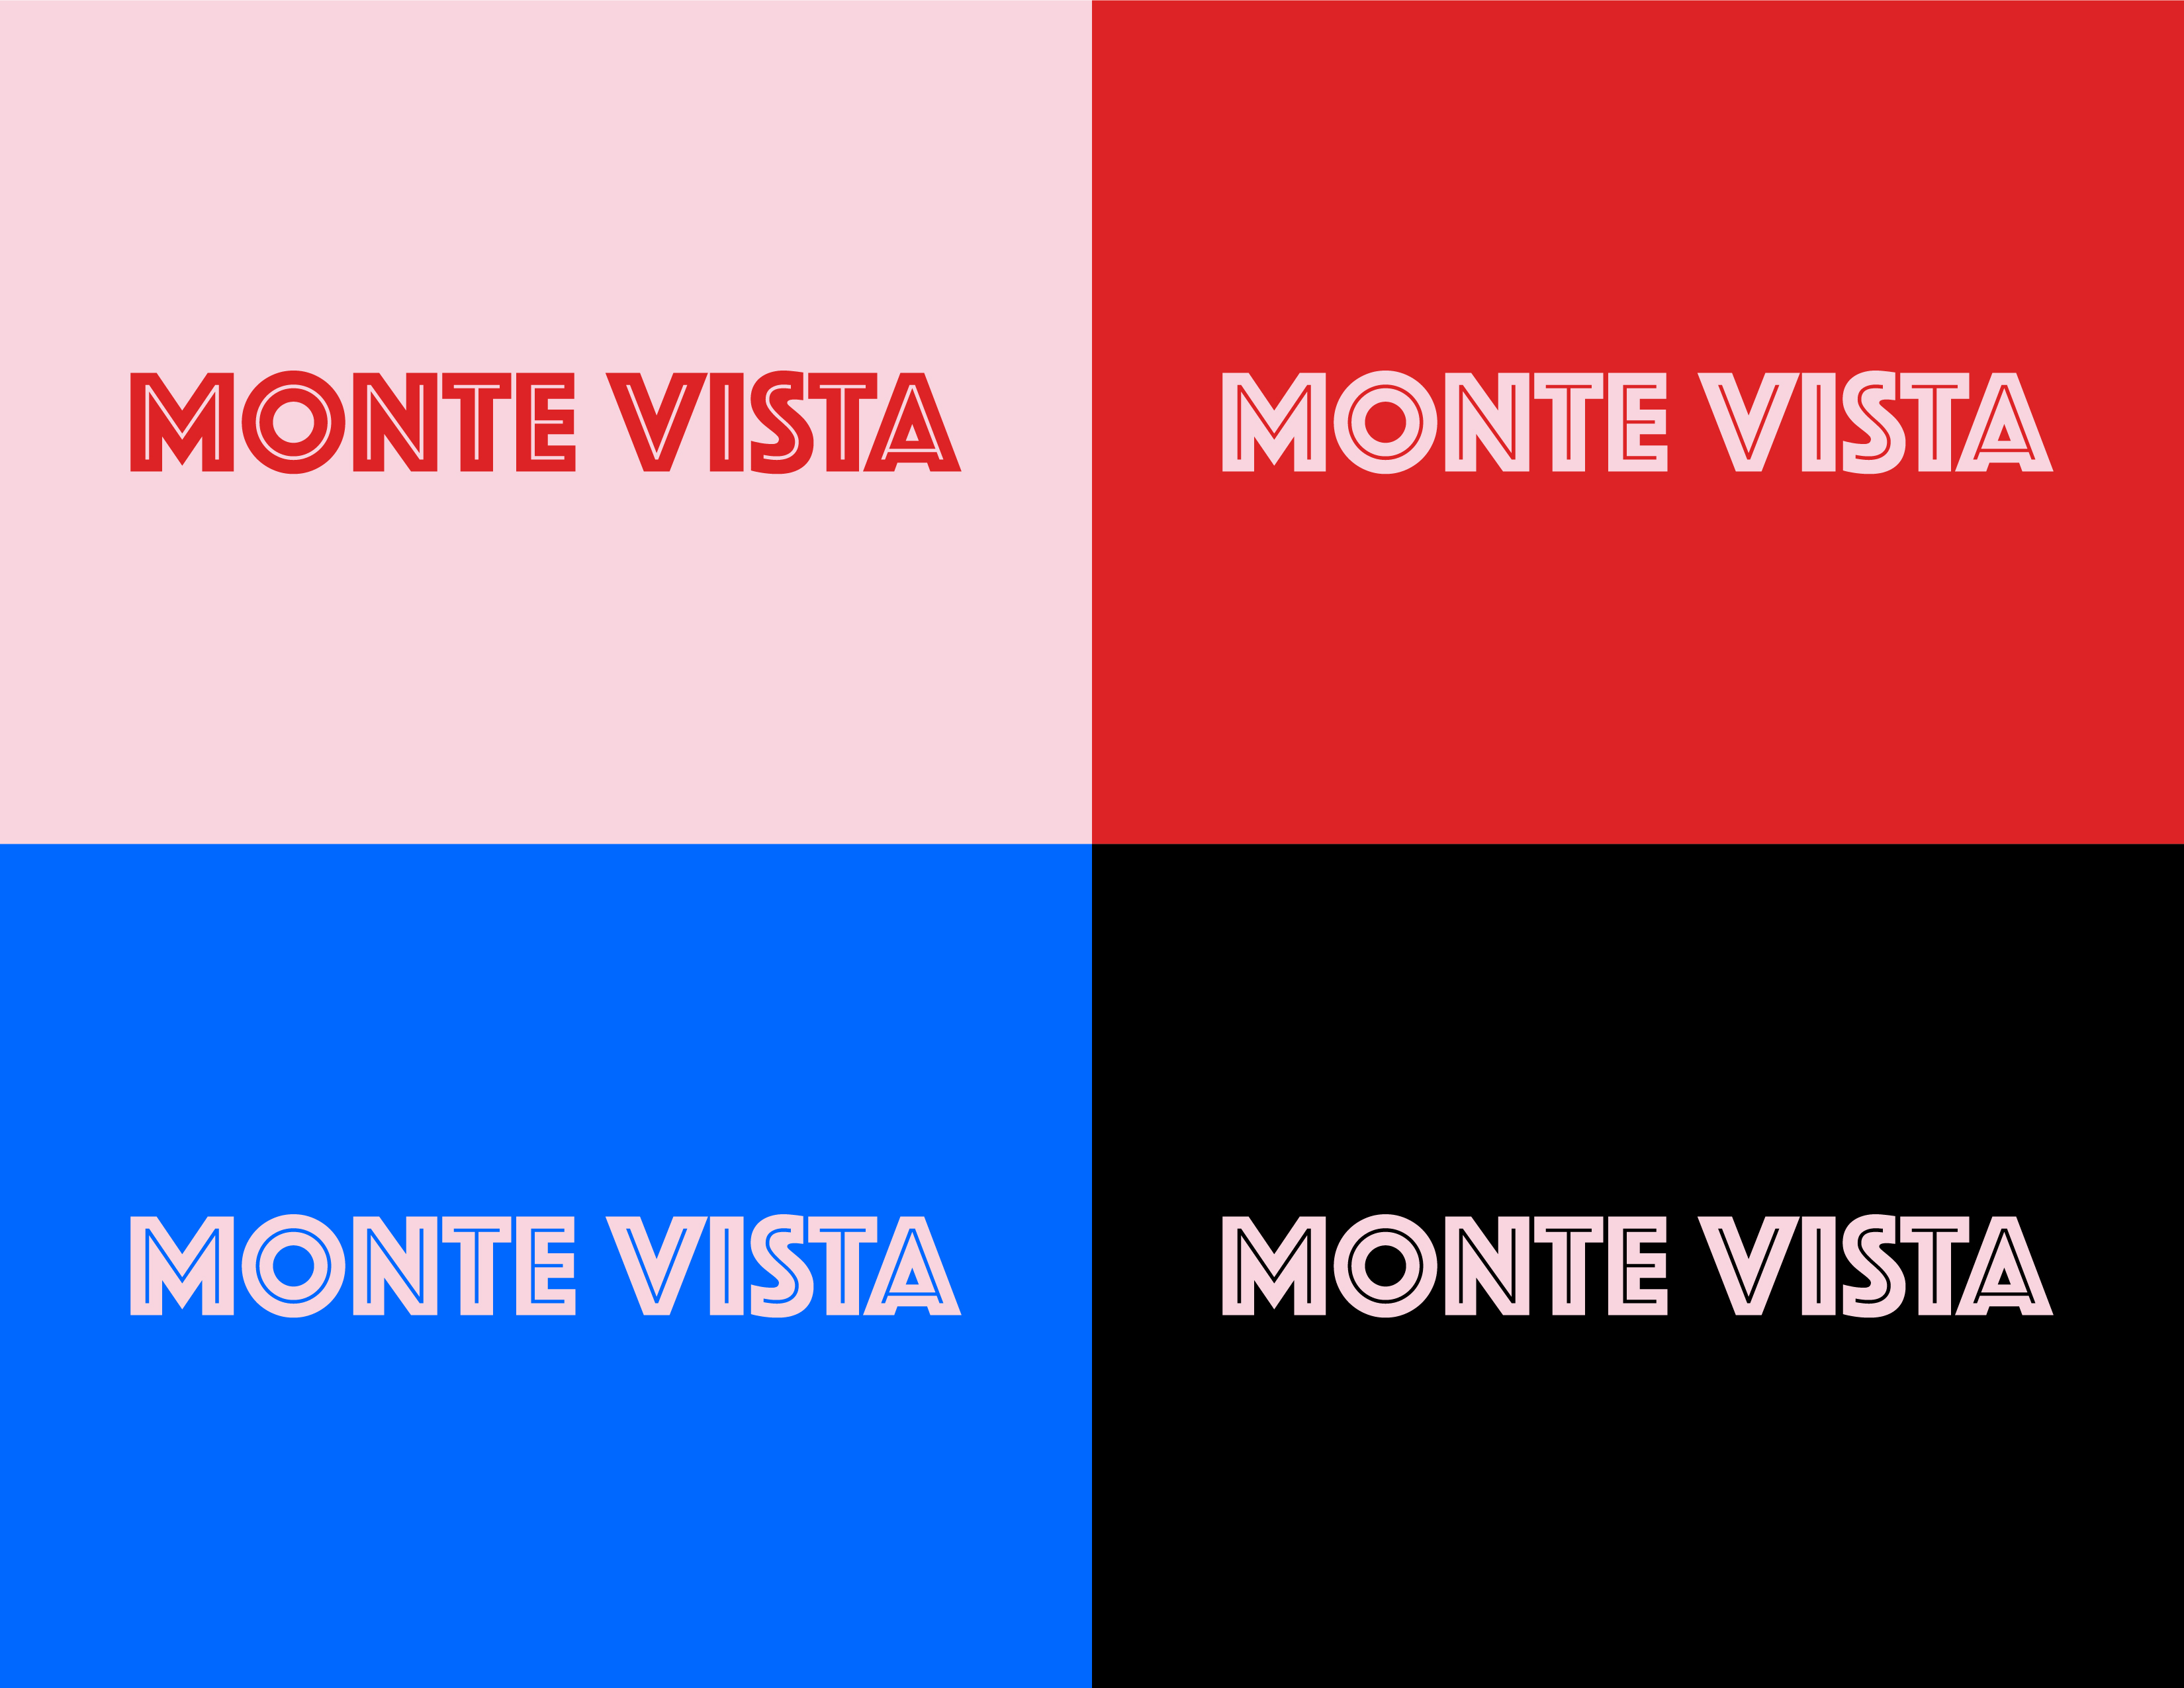 2_brandpad_template_hotel_monte_vista-11